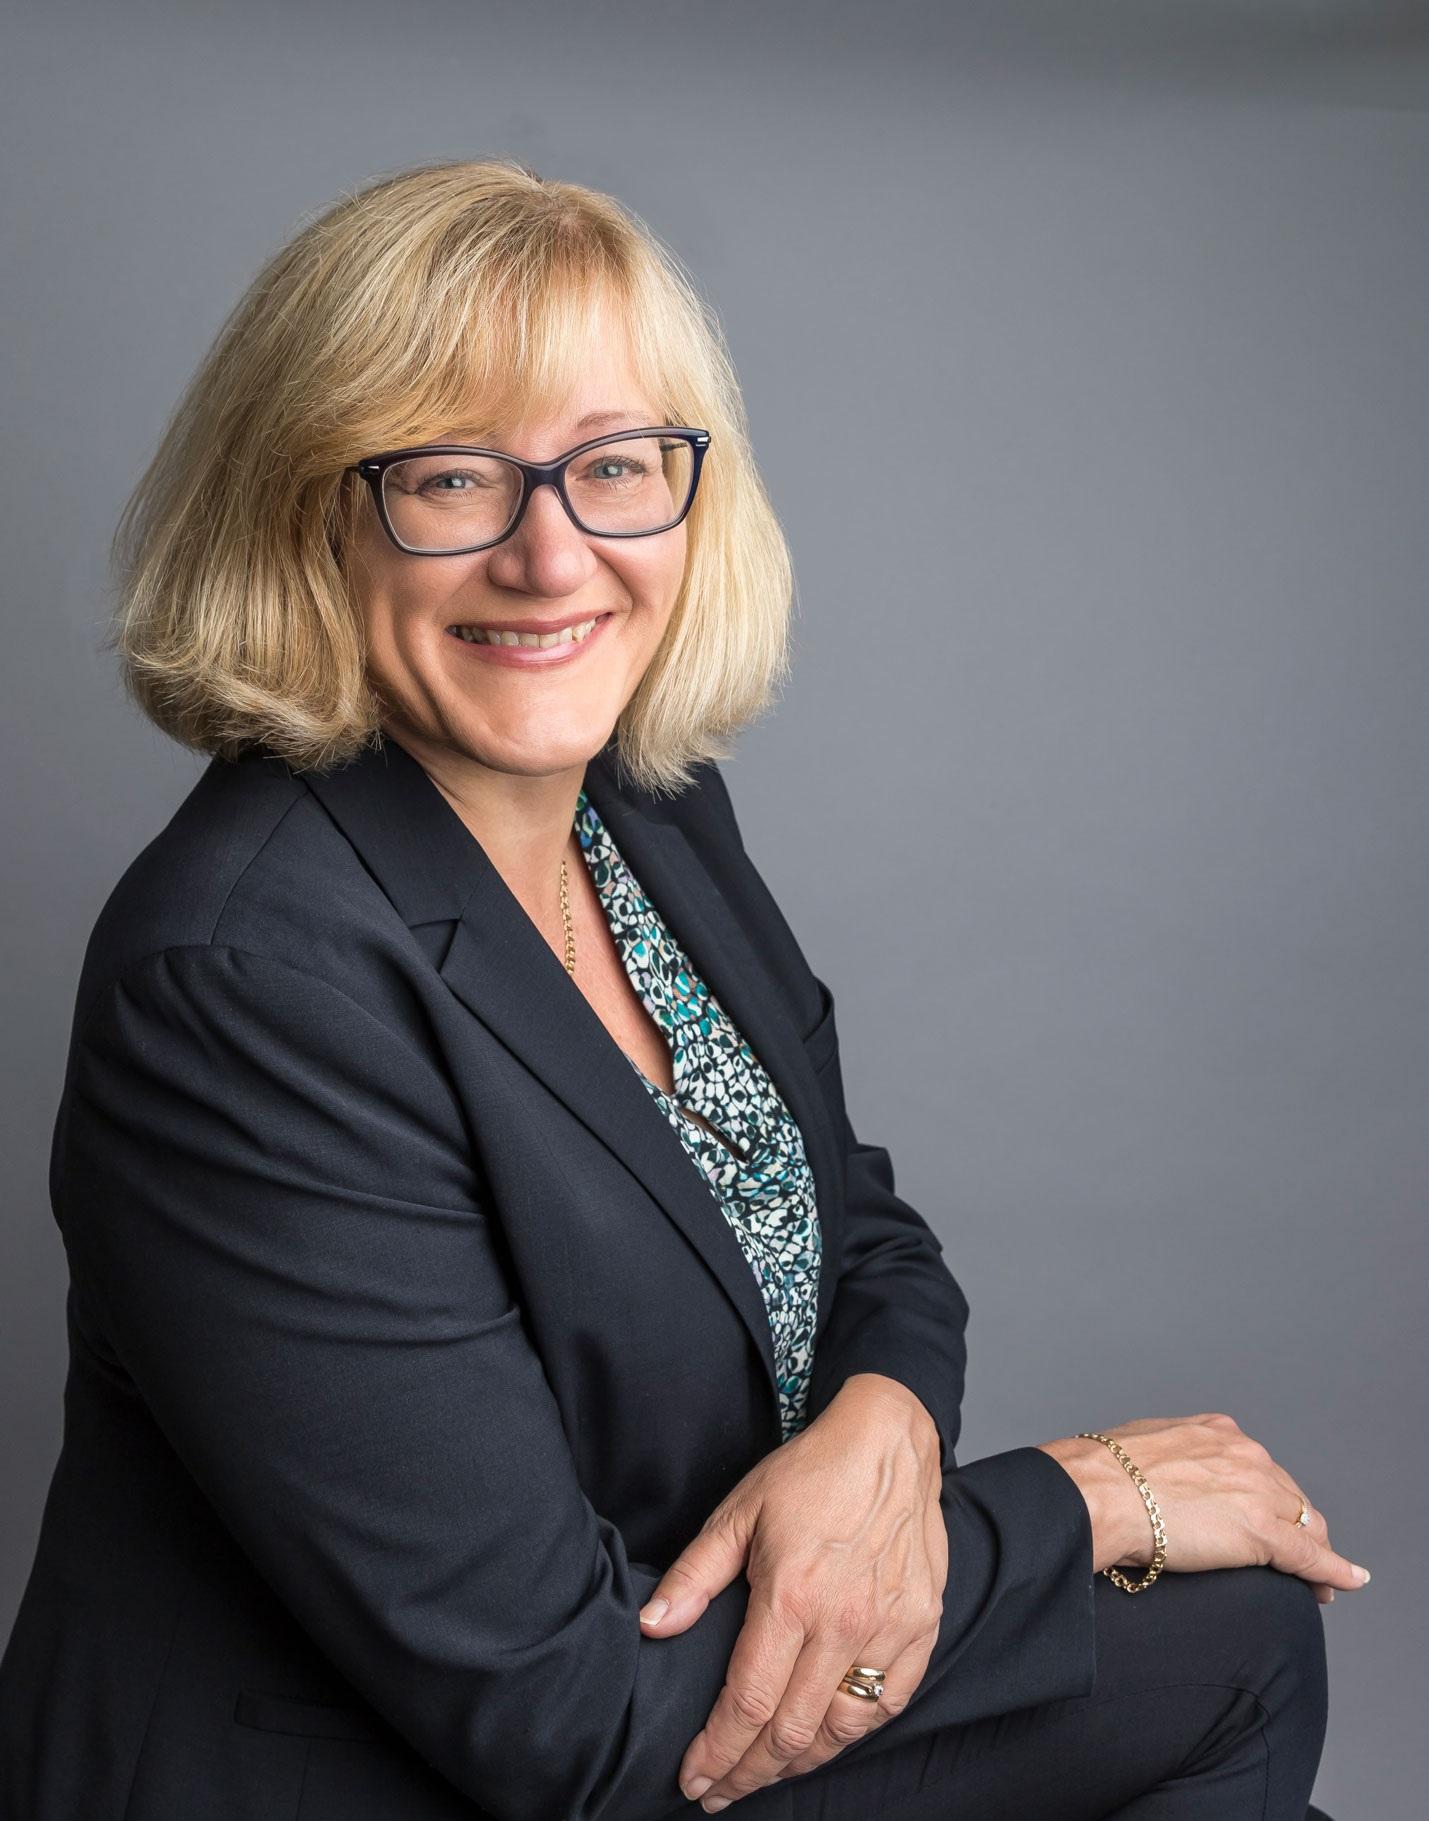 Katarina Nilsson-Moe